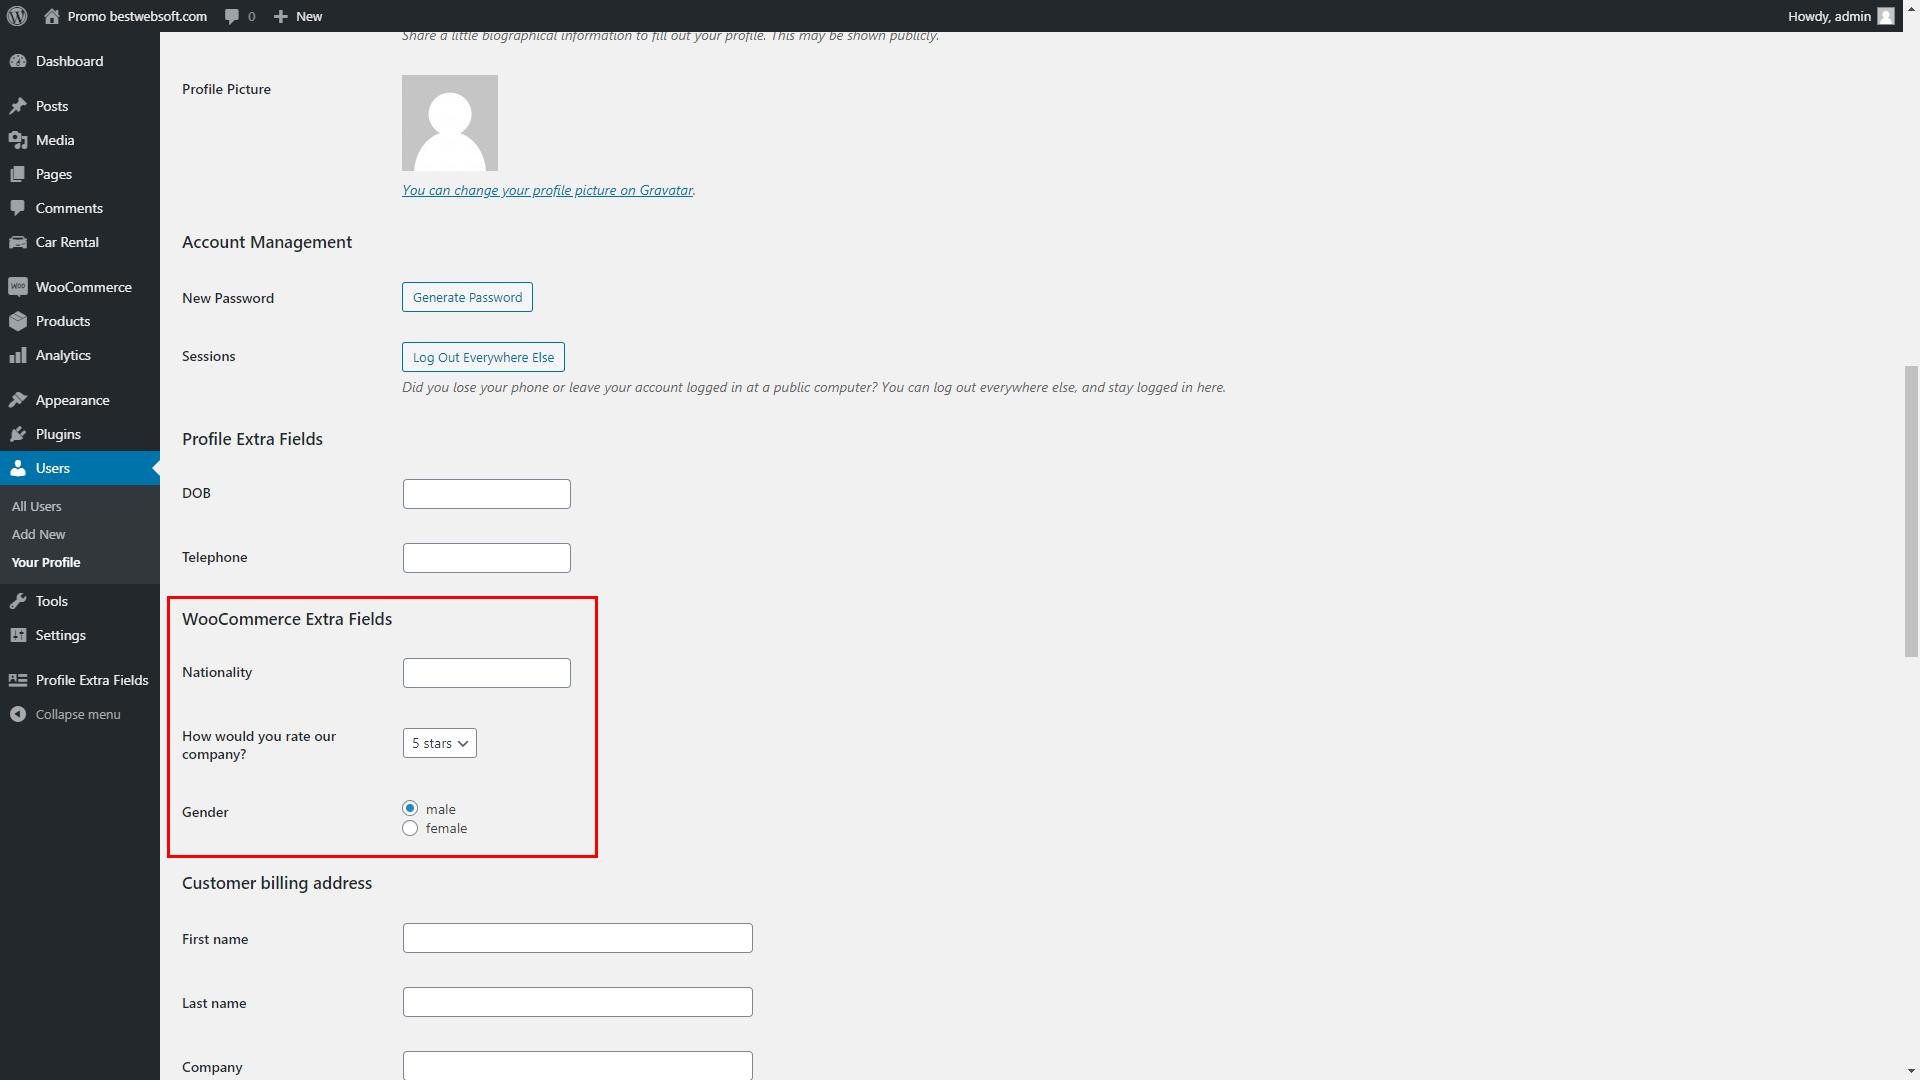 profile extra fields screenshot 16